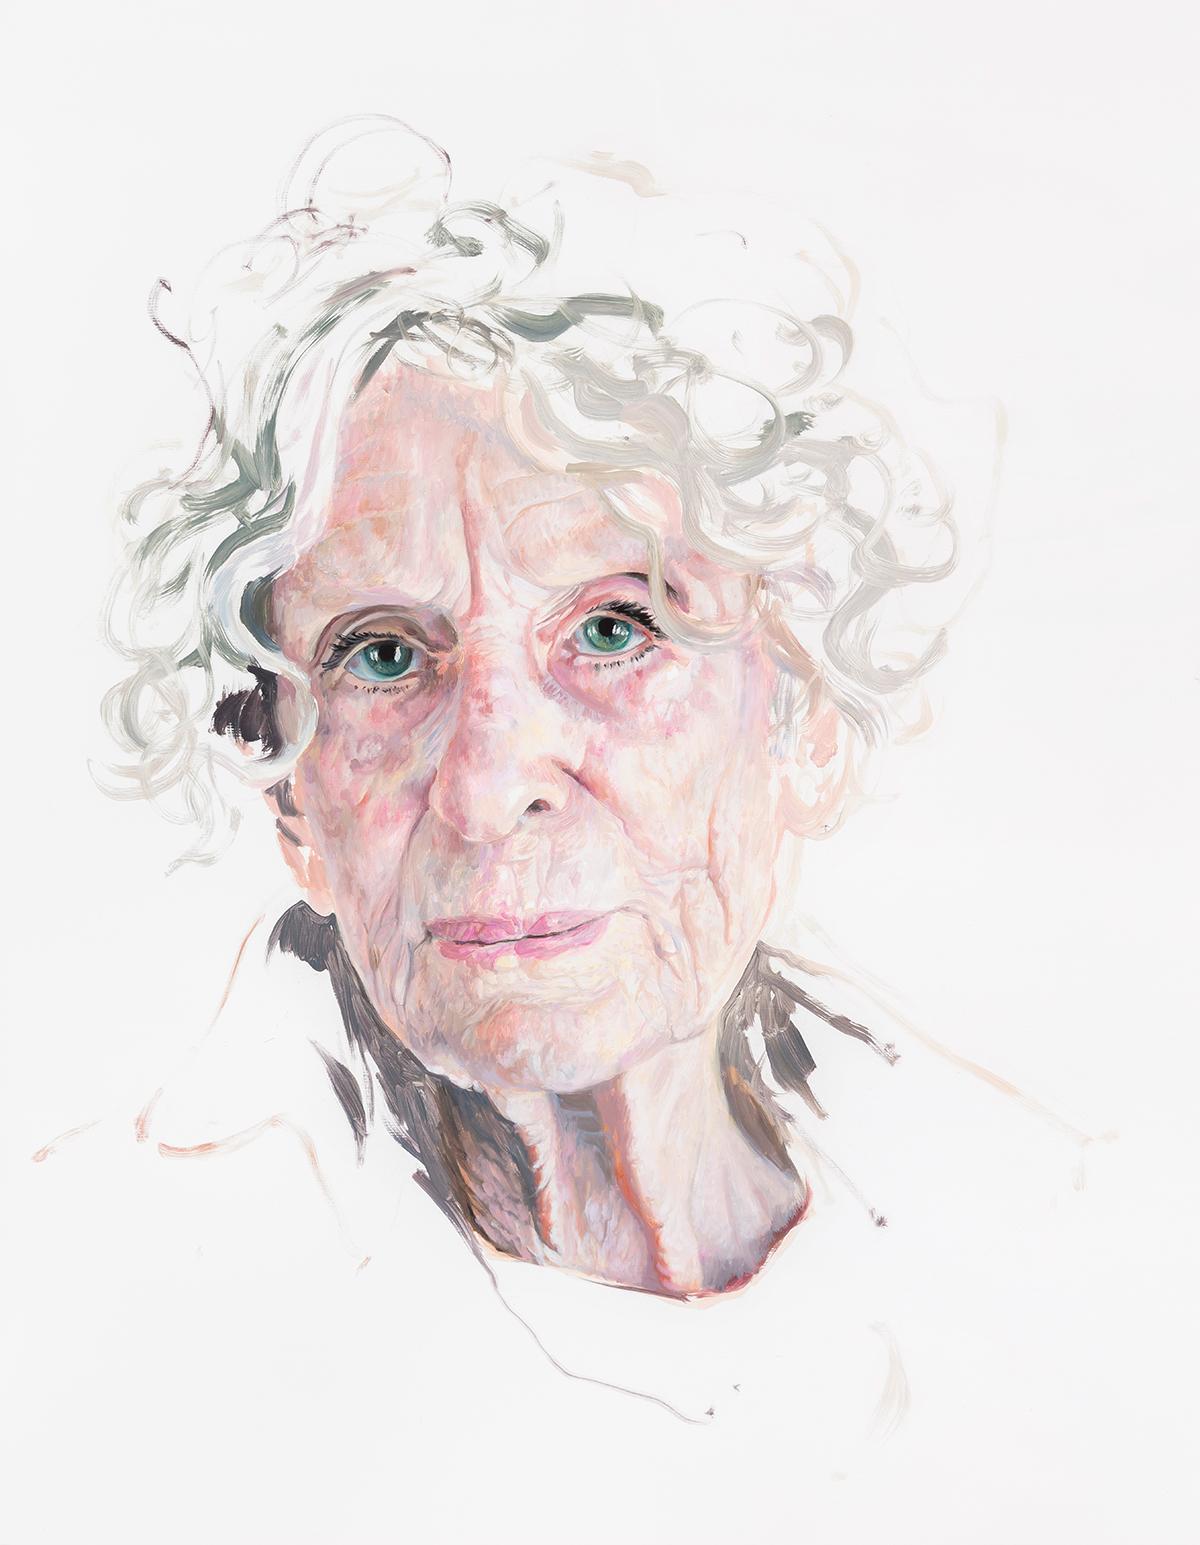 Deborah Poynton - Portrait of a Model 4, 2018